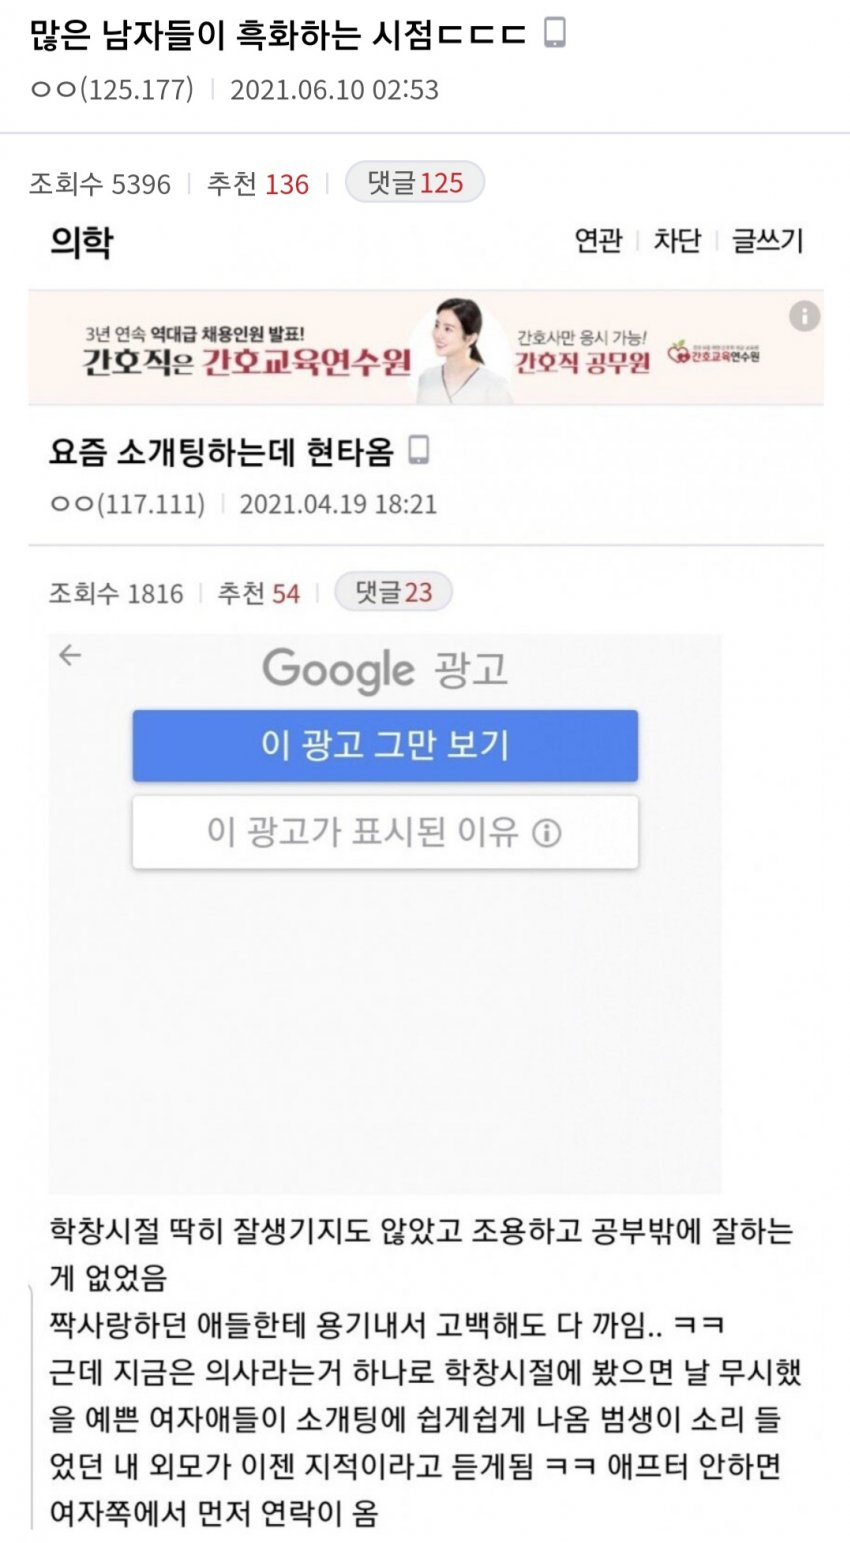 viewimage.php?no=24b0d769e1d32ca73fec8ffa11d0283194eeae3ea3f7d0da351cf9d34384701376c4c03579e7ce6558f2ed9b12228dd0d1e3a03a5e1a15ab31439a07521eddf781db34919ca4f2c9100adc70eacfa938e59f6738b0